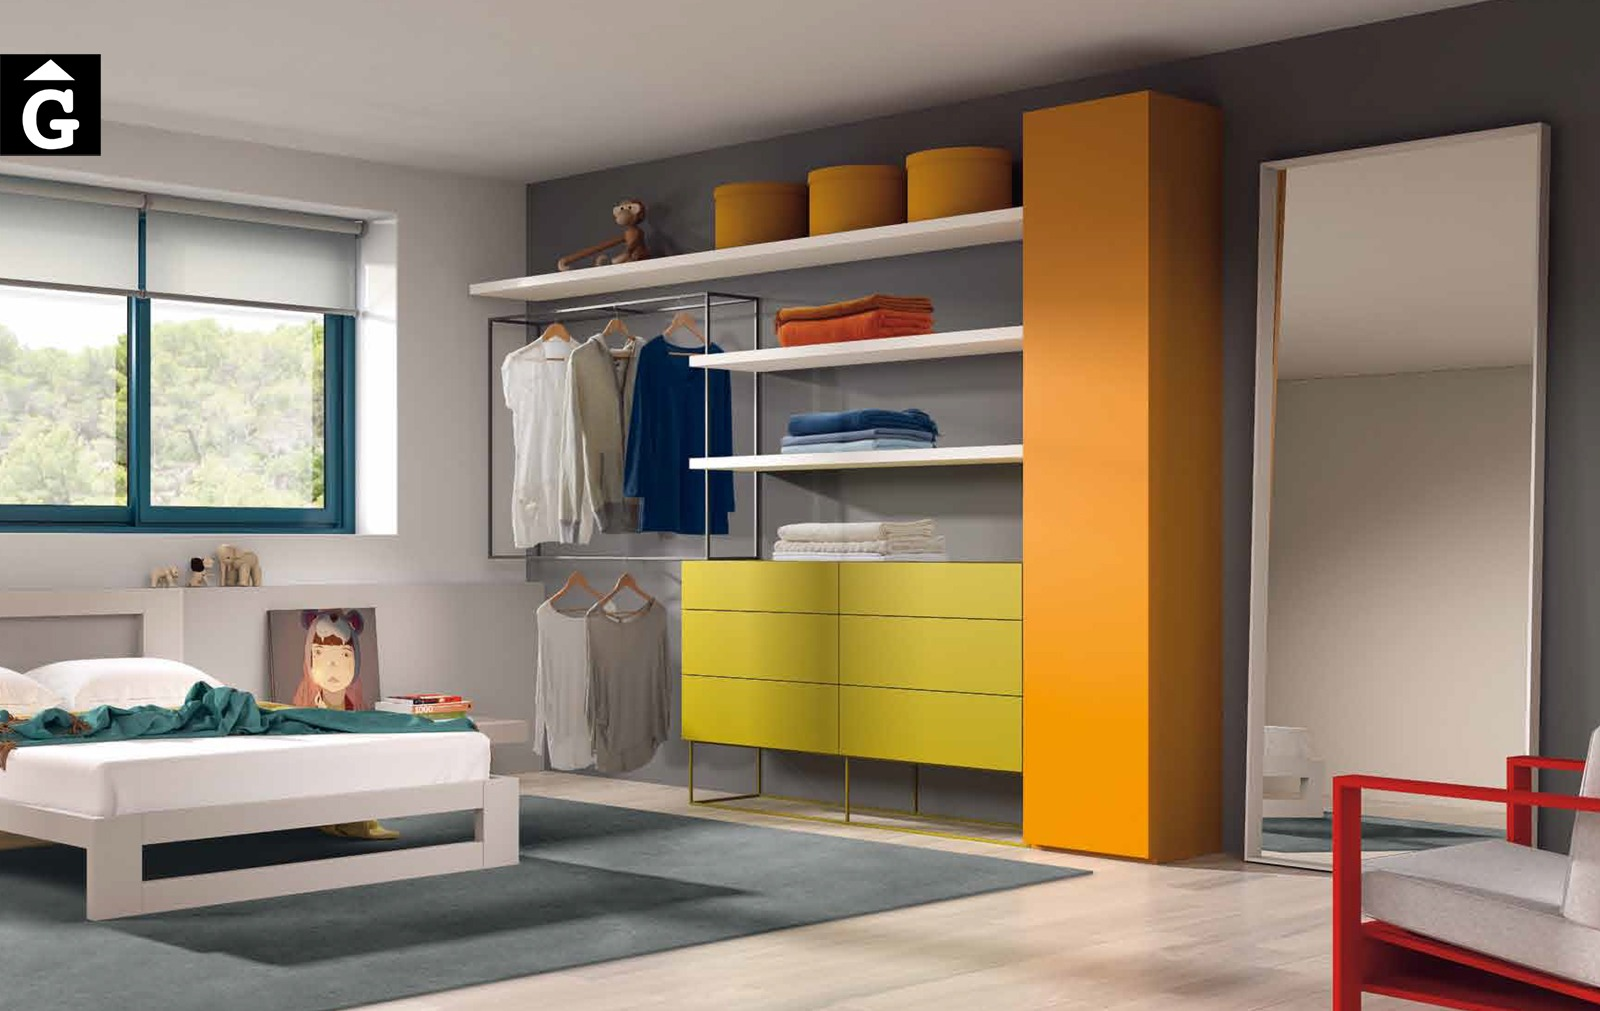 Vestidor juvenil color Besform by Mobles GIFREU Armaris Vestidors Habitcions a mida modern minim elegant atemporal